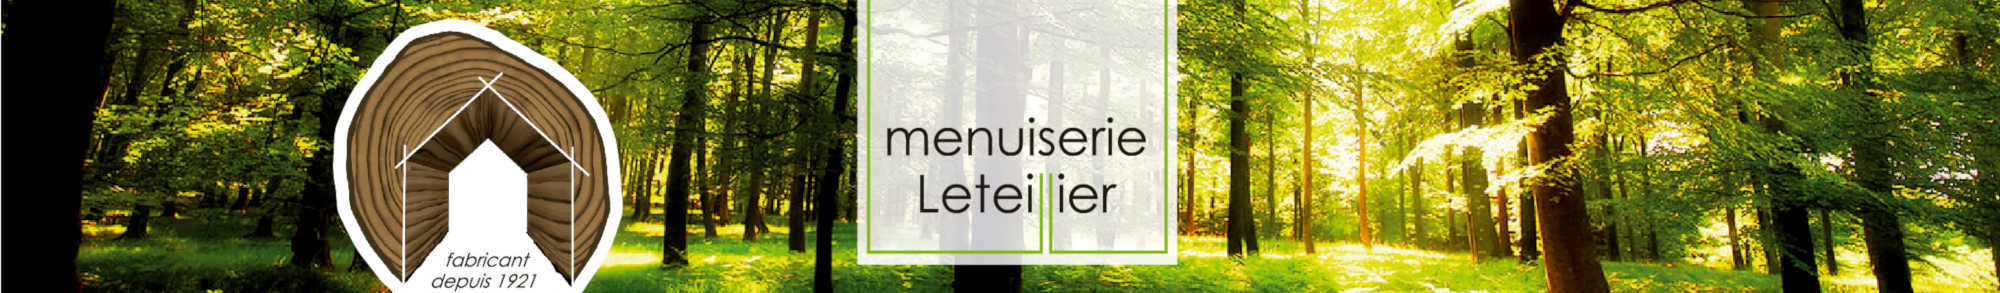 Menuiserie Guillaume Leteillier